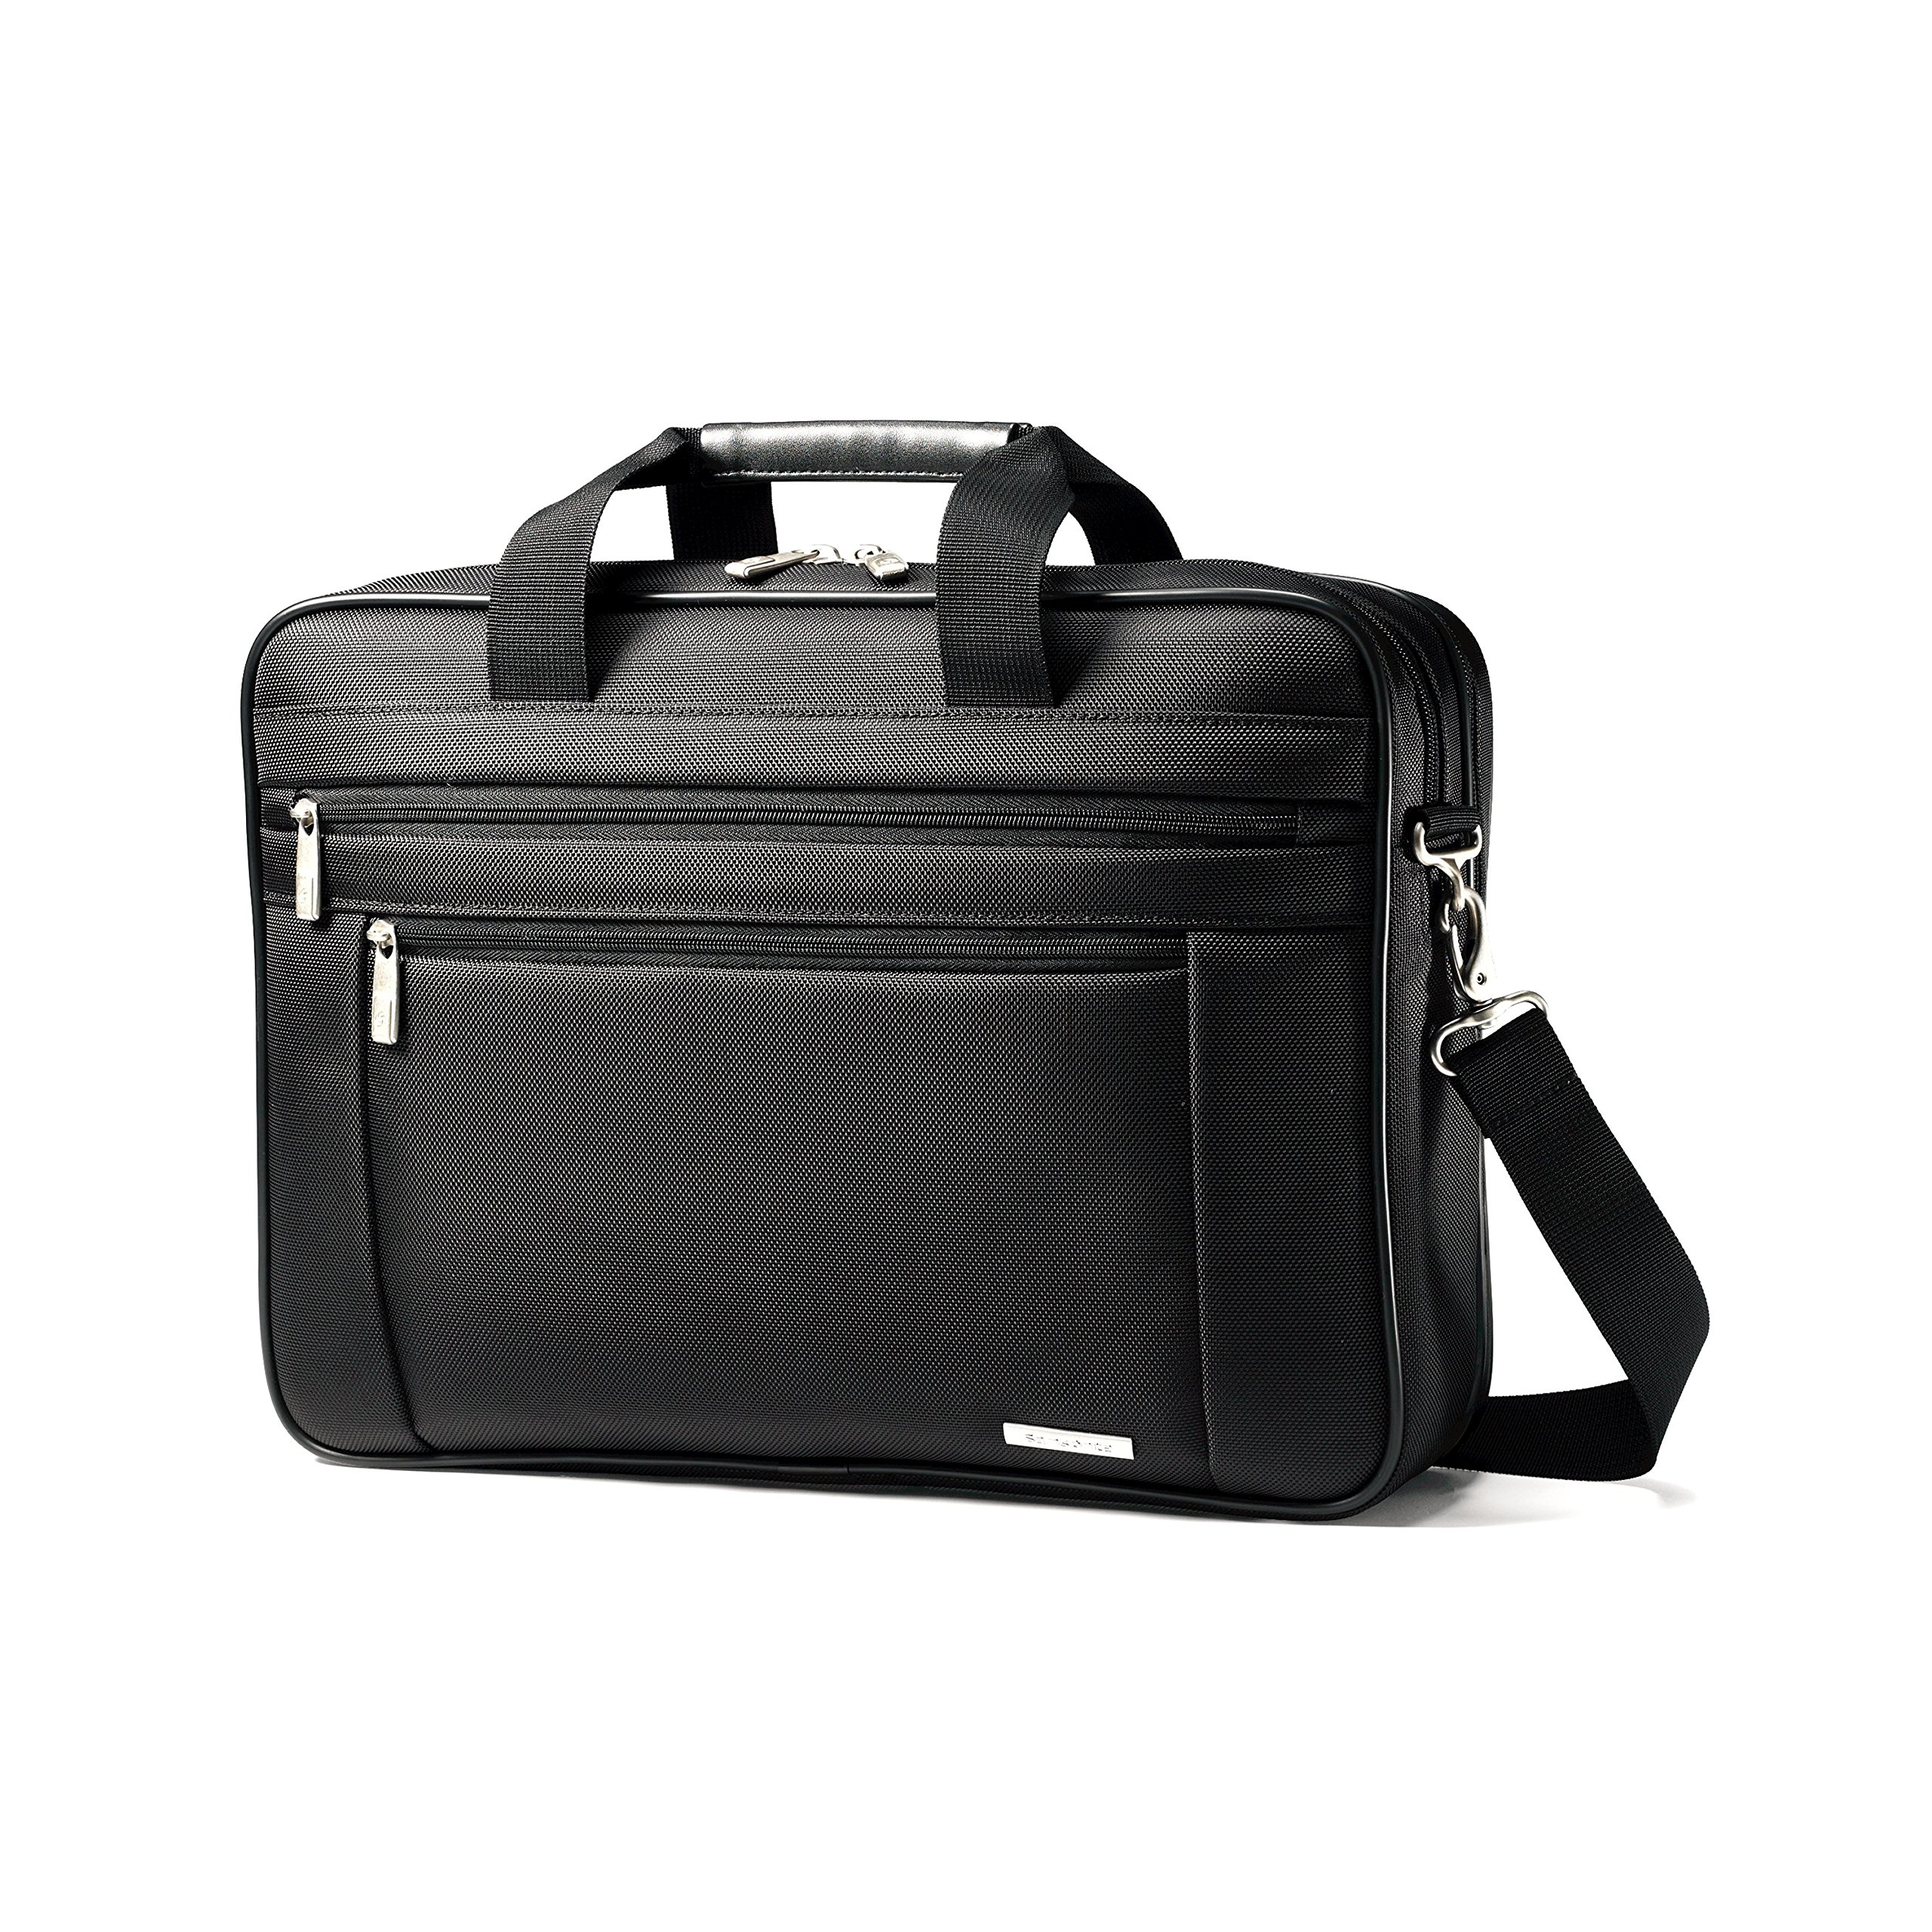 Samsonite Classic Business Perfect Fit Two Gusset Laptop Bag - 15.6'' Black